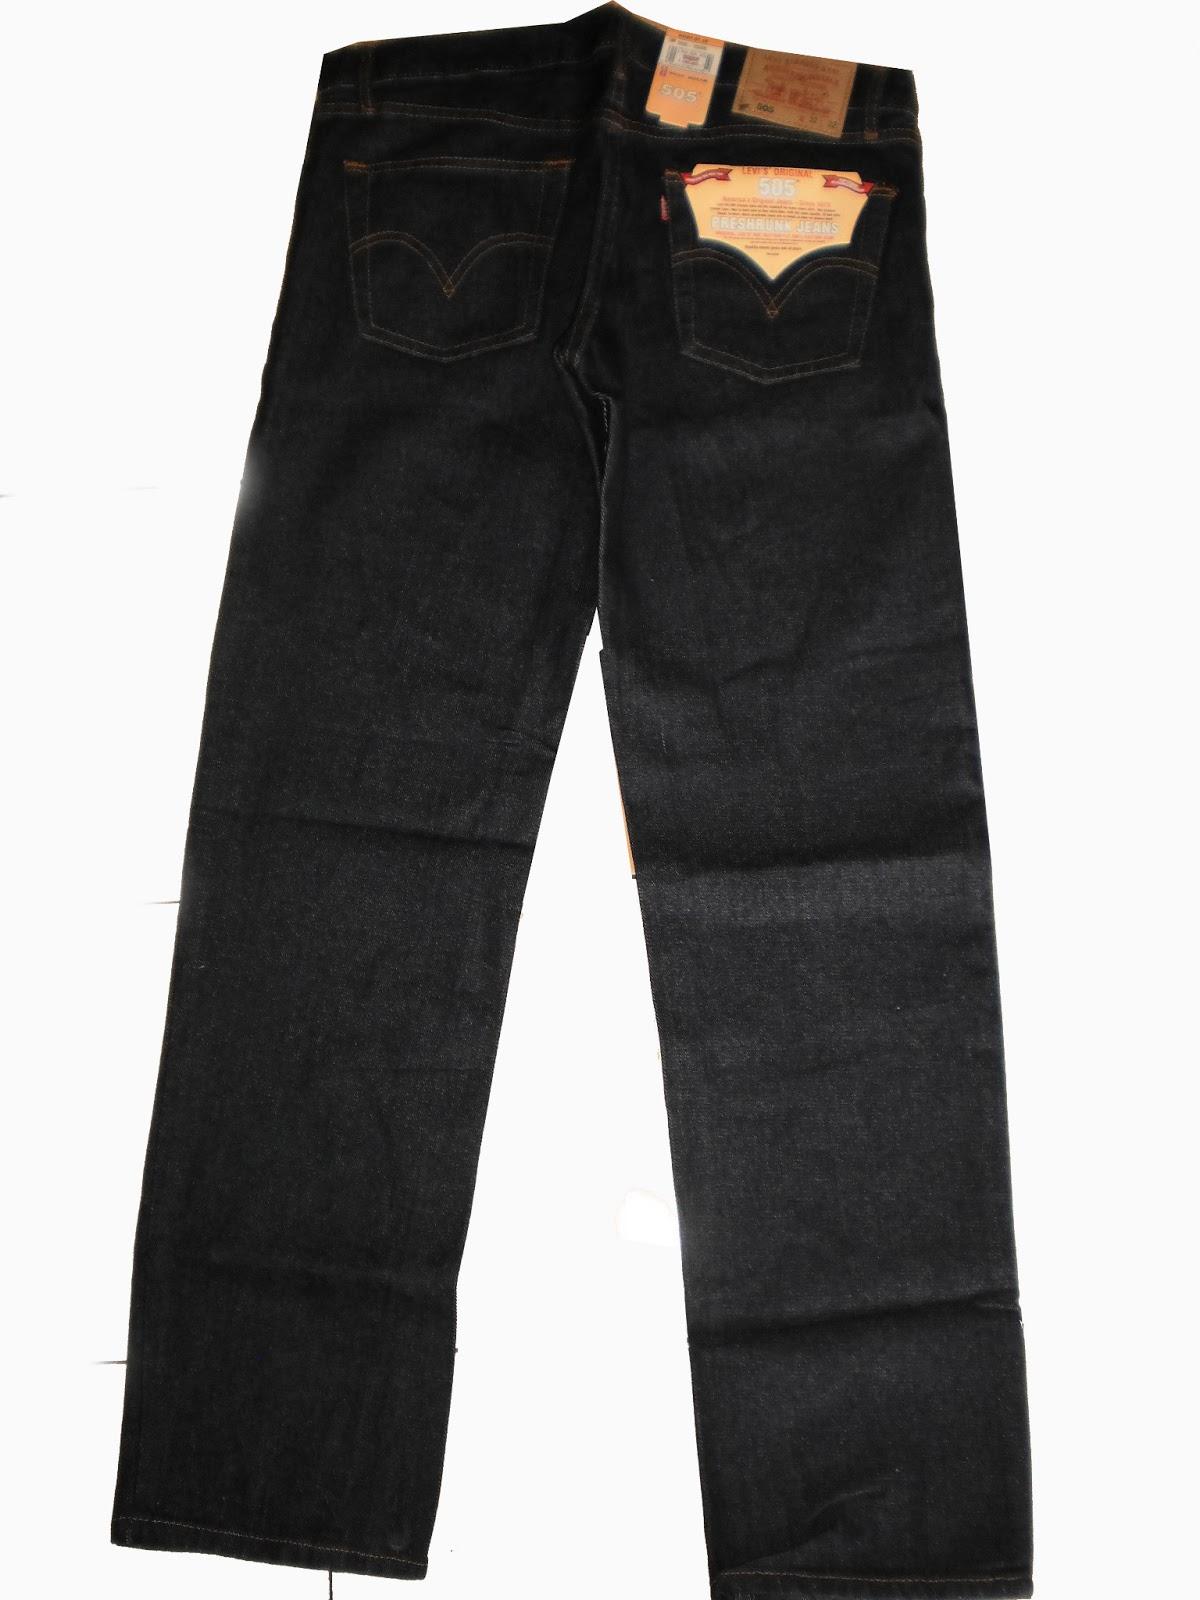 ilmu pengetahuan 1 mewarnai celana jeans